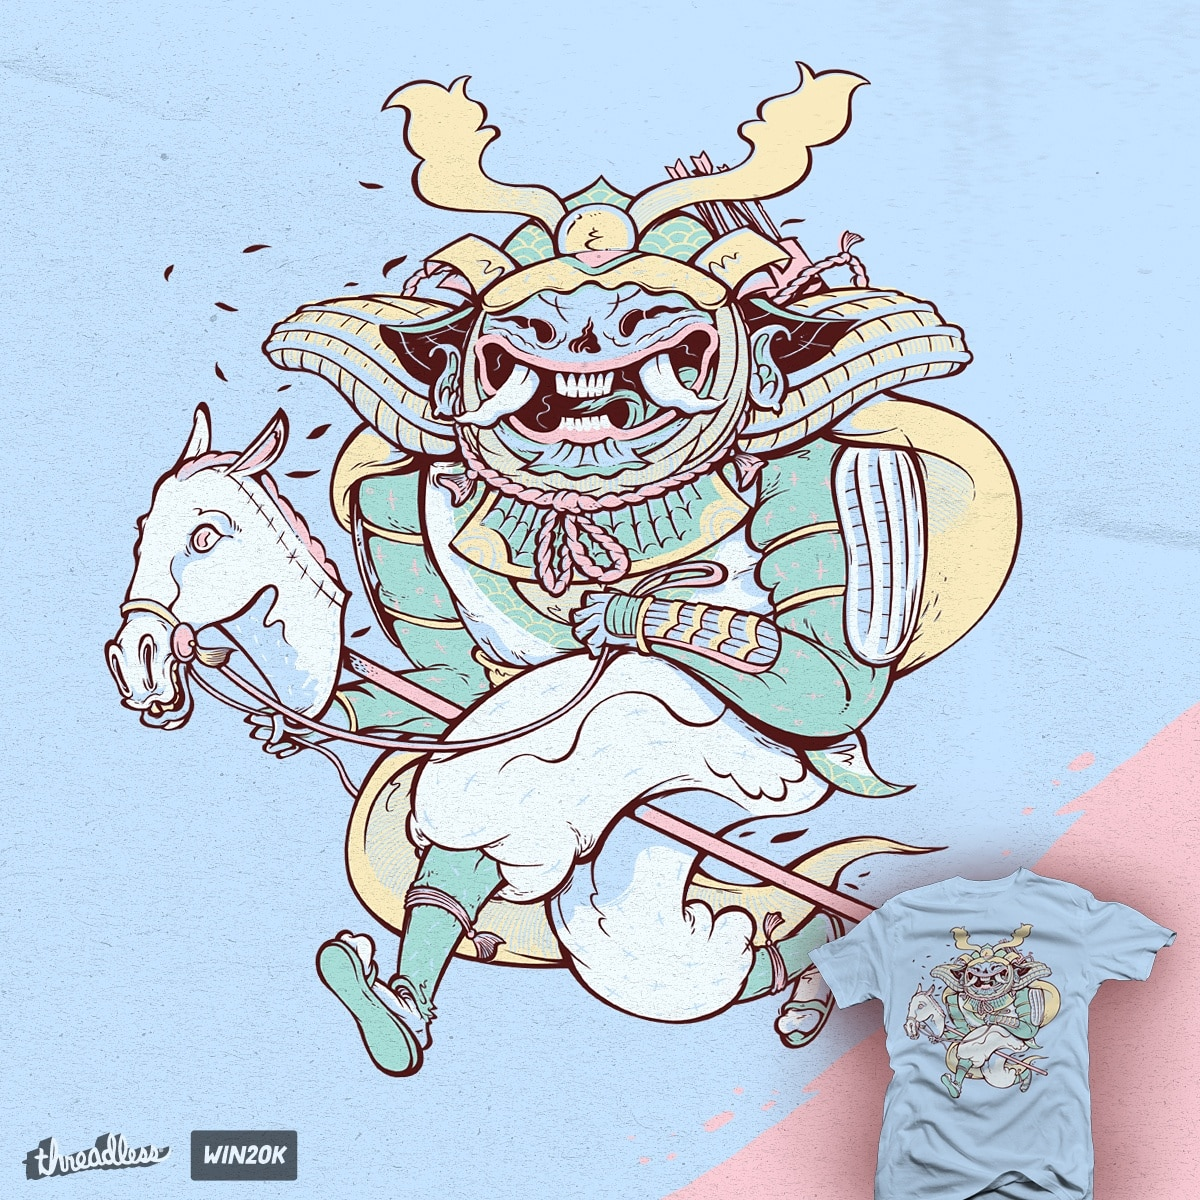 Samurai Hack by citizen rifferson on Threadless